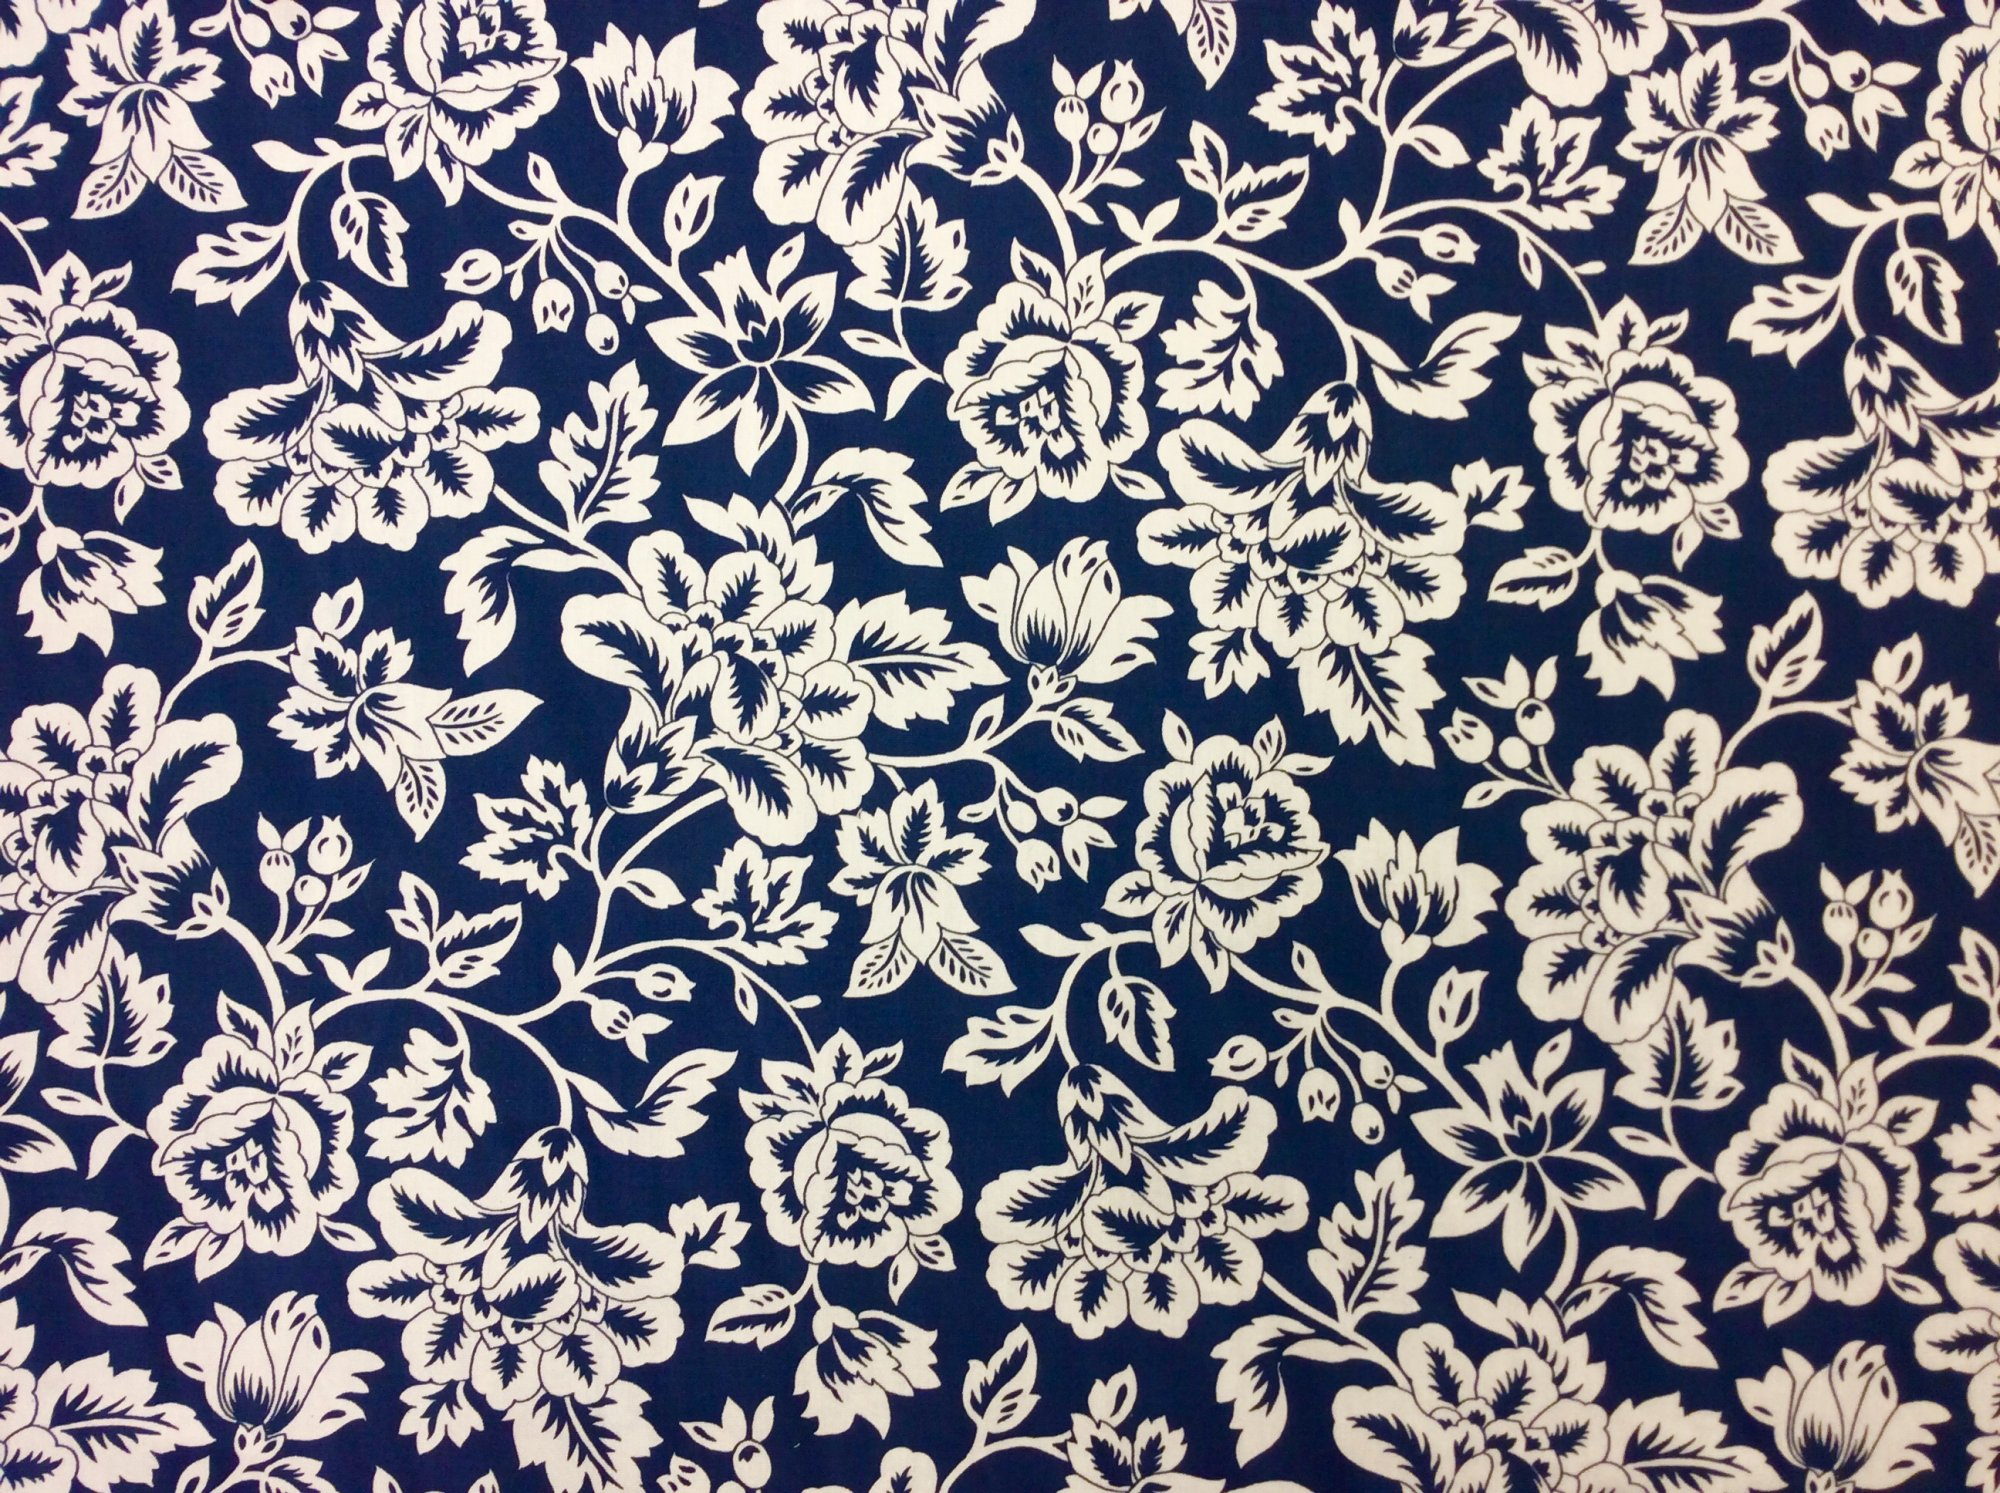 Floral Navy Modern Retro Flower Sun Navy  White Outdoor Fabric OS574